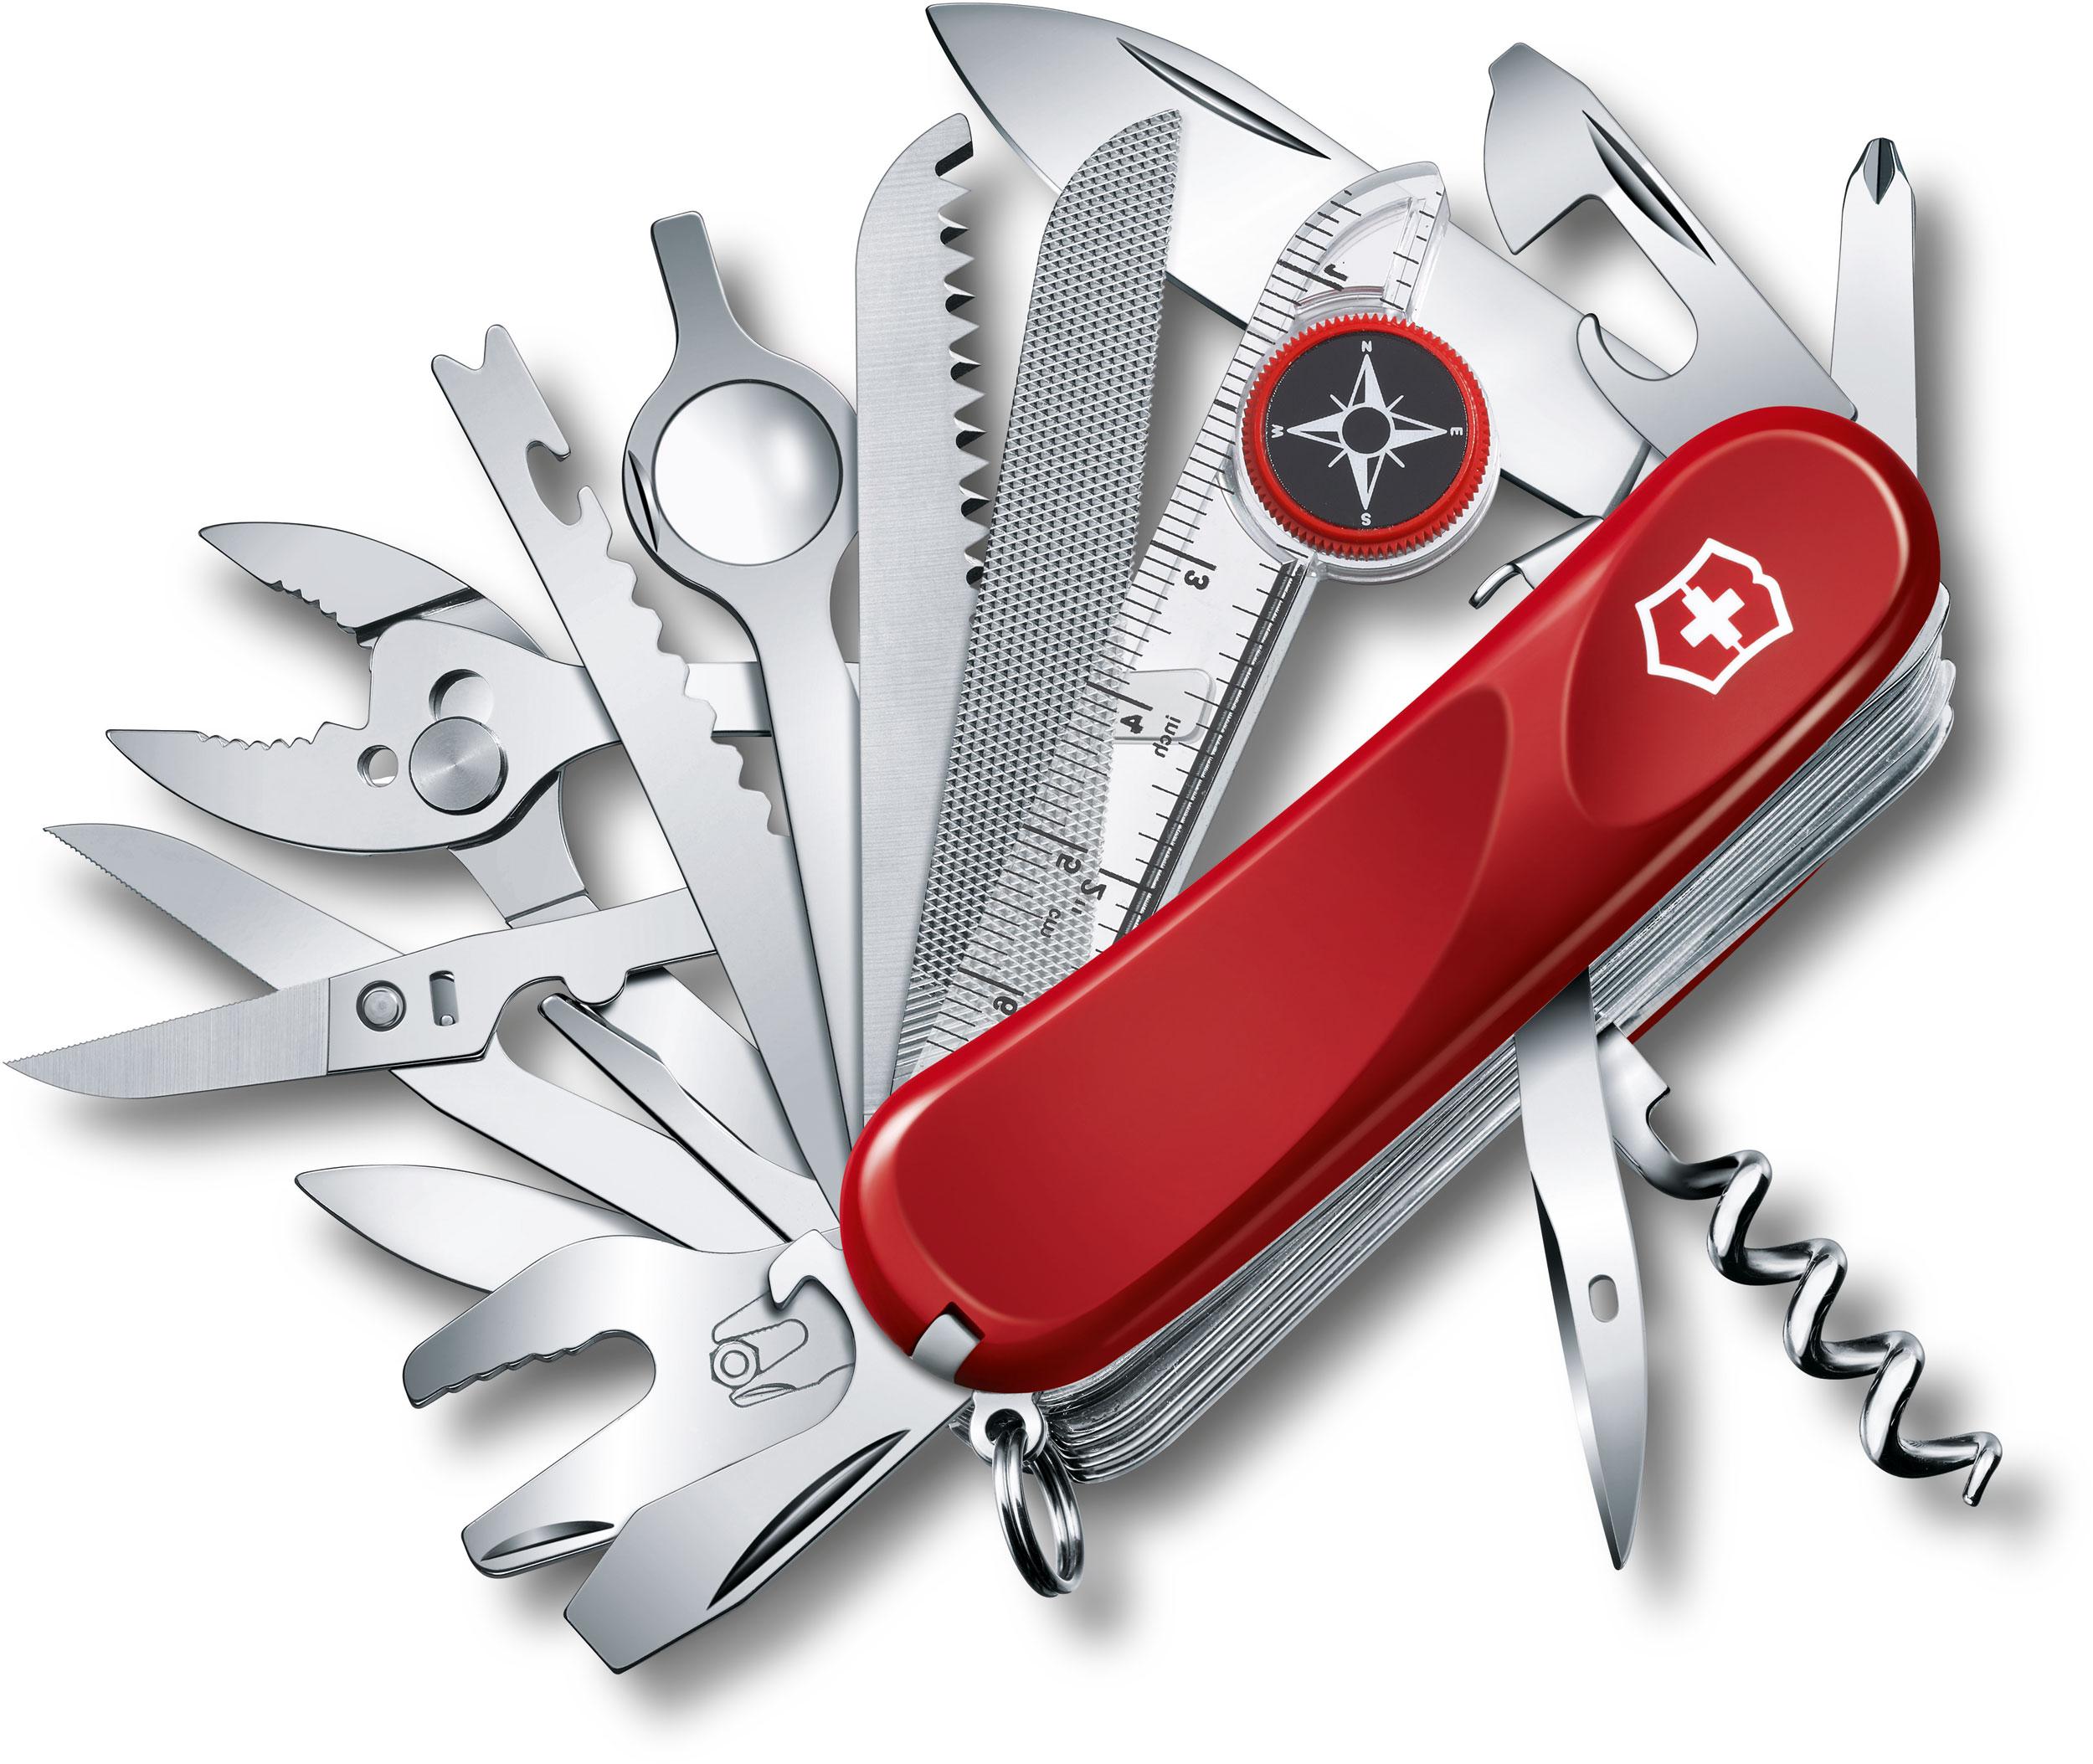 Victorinox Swiss Army Evolution S54 ToolChest Plus Multi-Tool 3-1/4 inch Red Handles (2.5393.SEUS2)